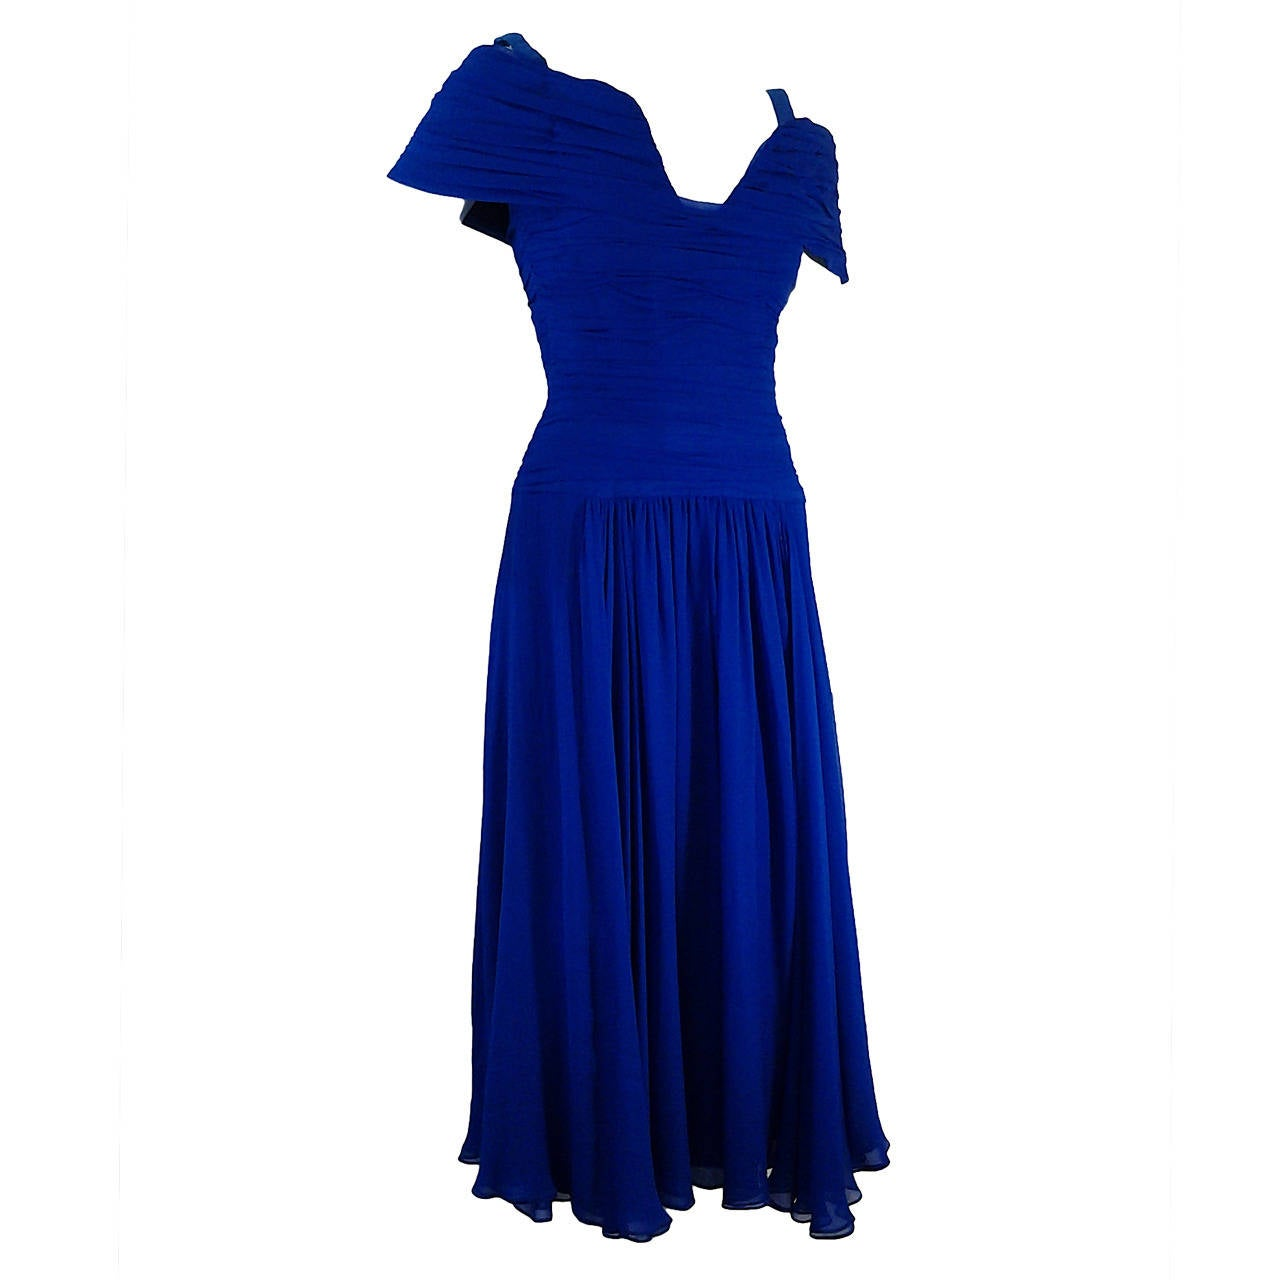 1980s Arnold Scaasi Cobalt Blue Silk Chiffon Gown w/ Gorgeous Décolletage